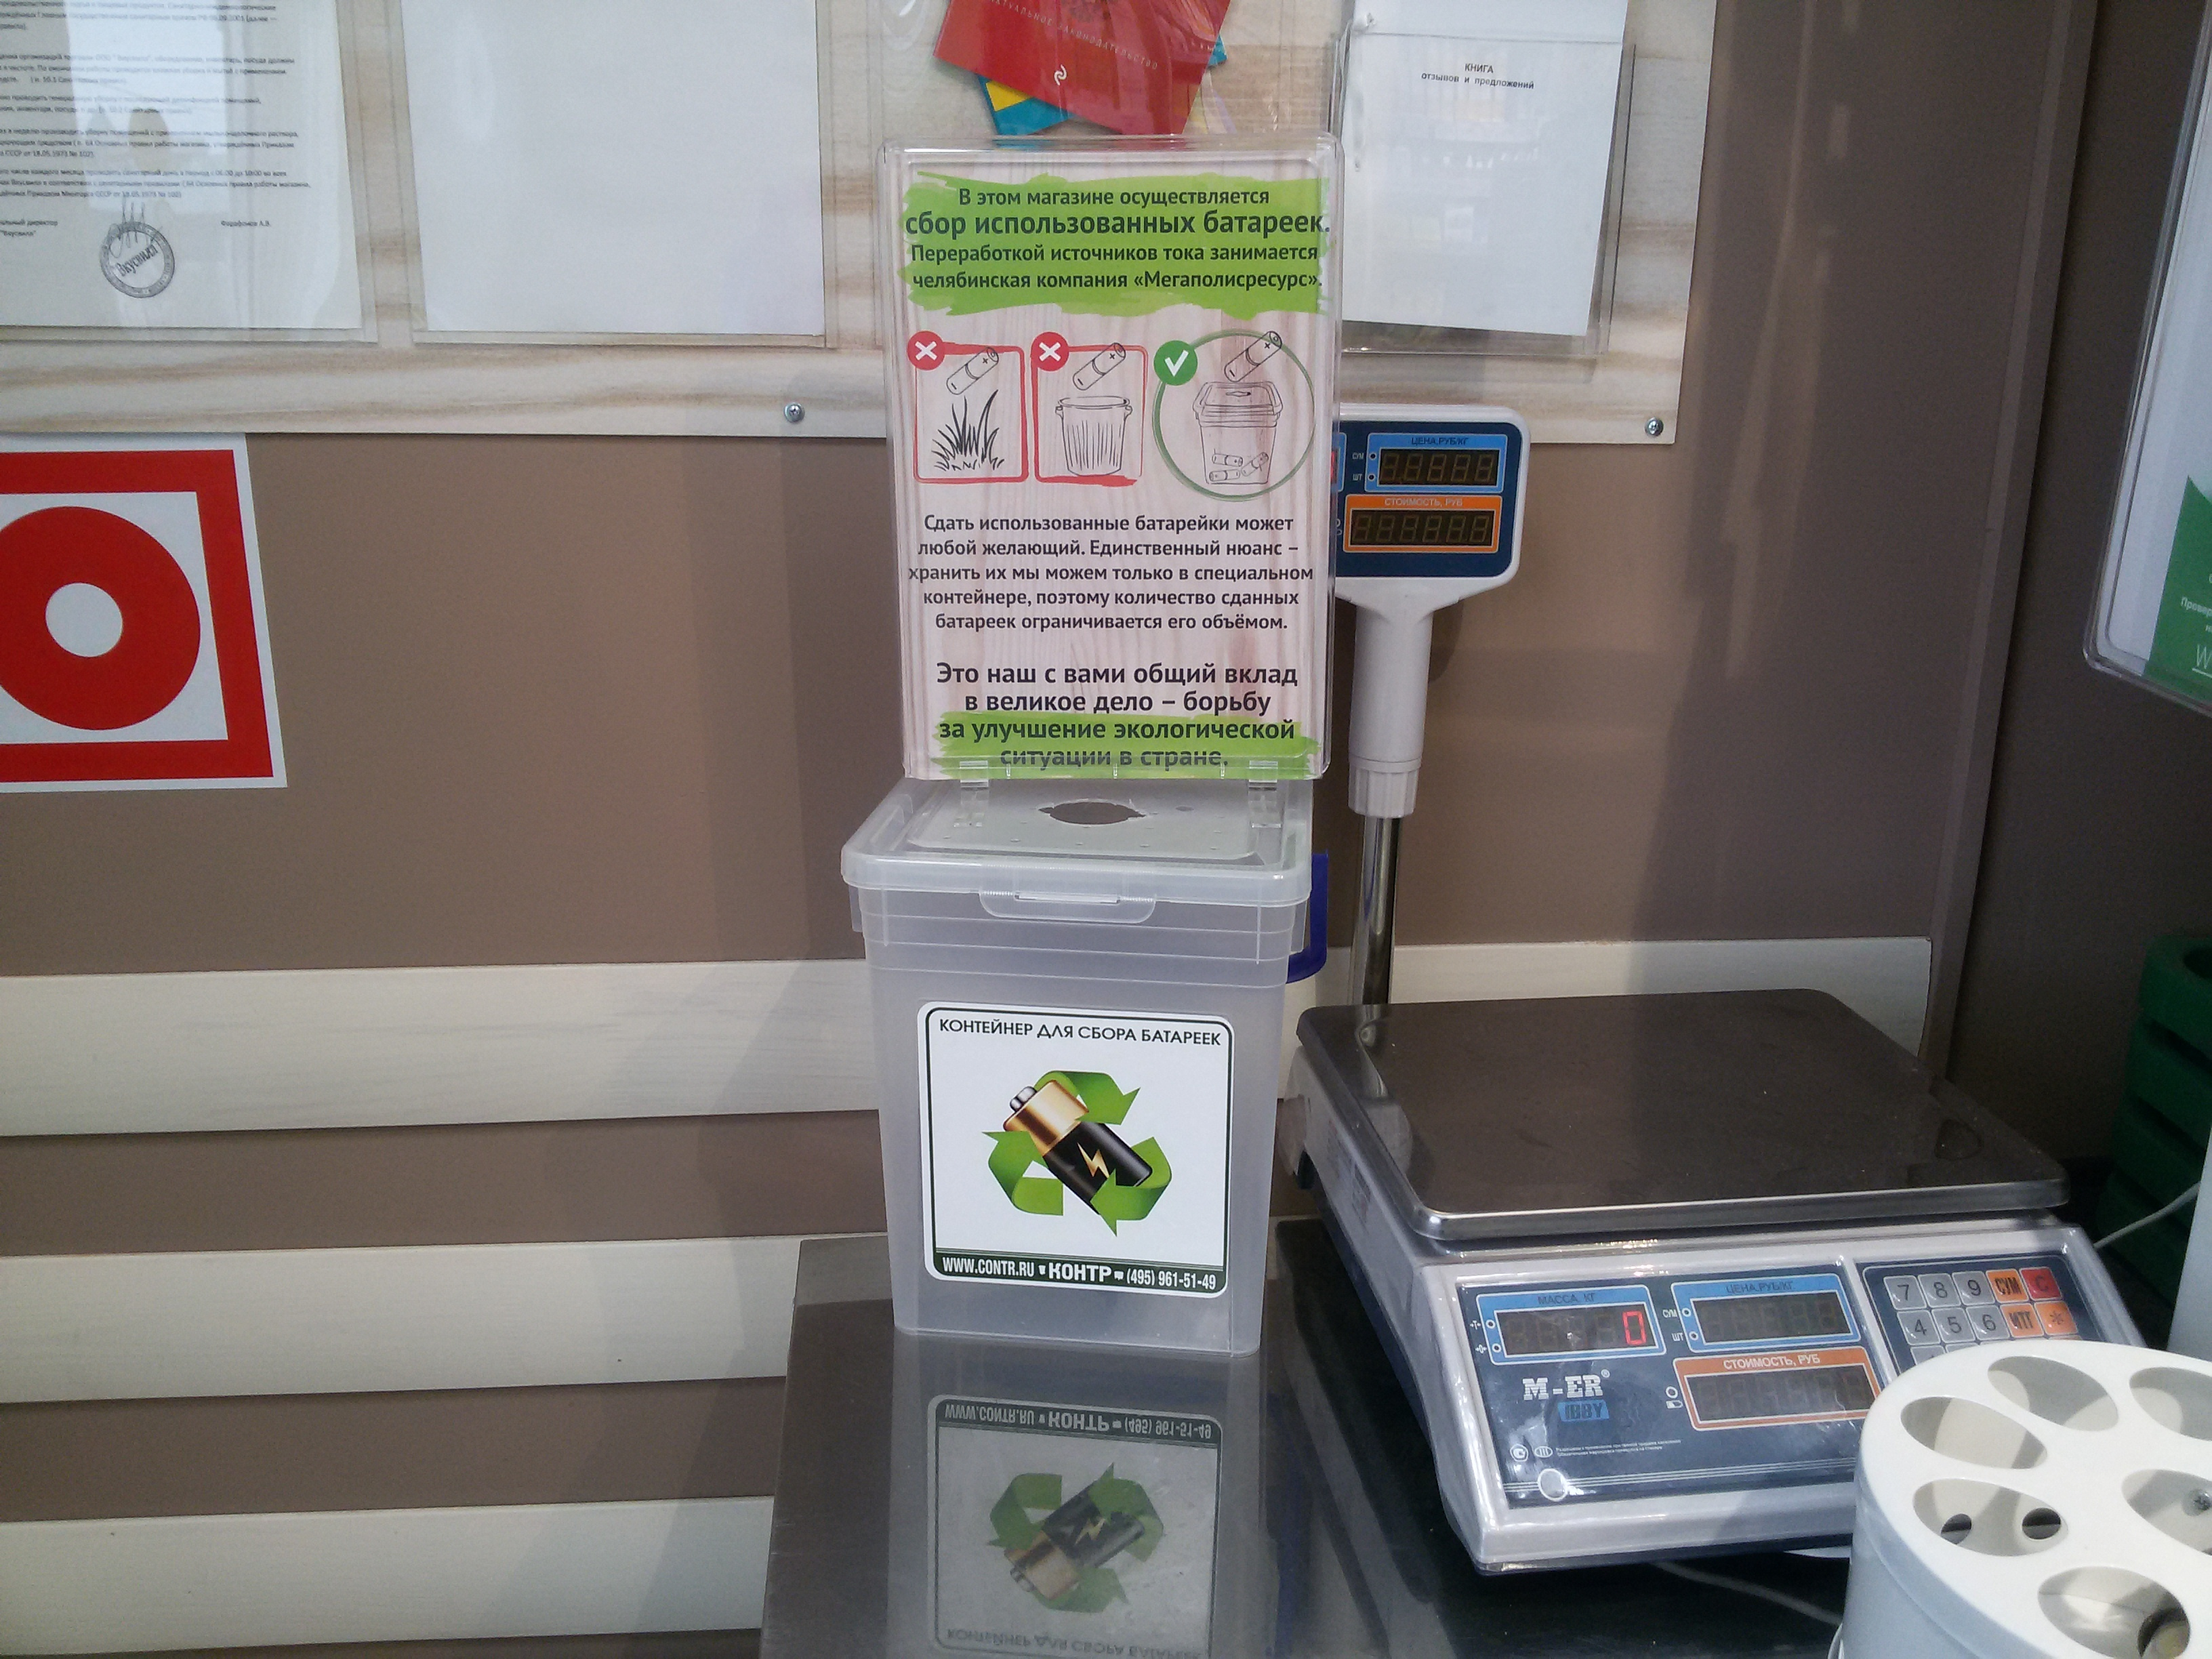 Hazardous Waste is No Longer Hazardous